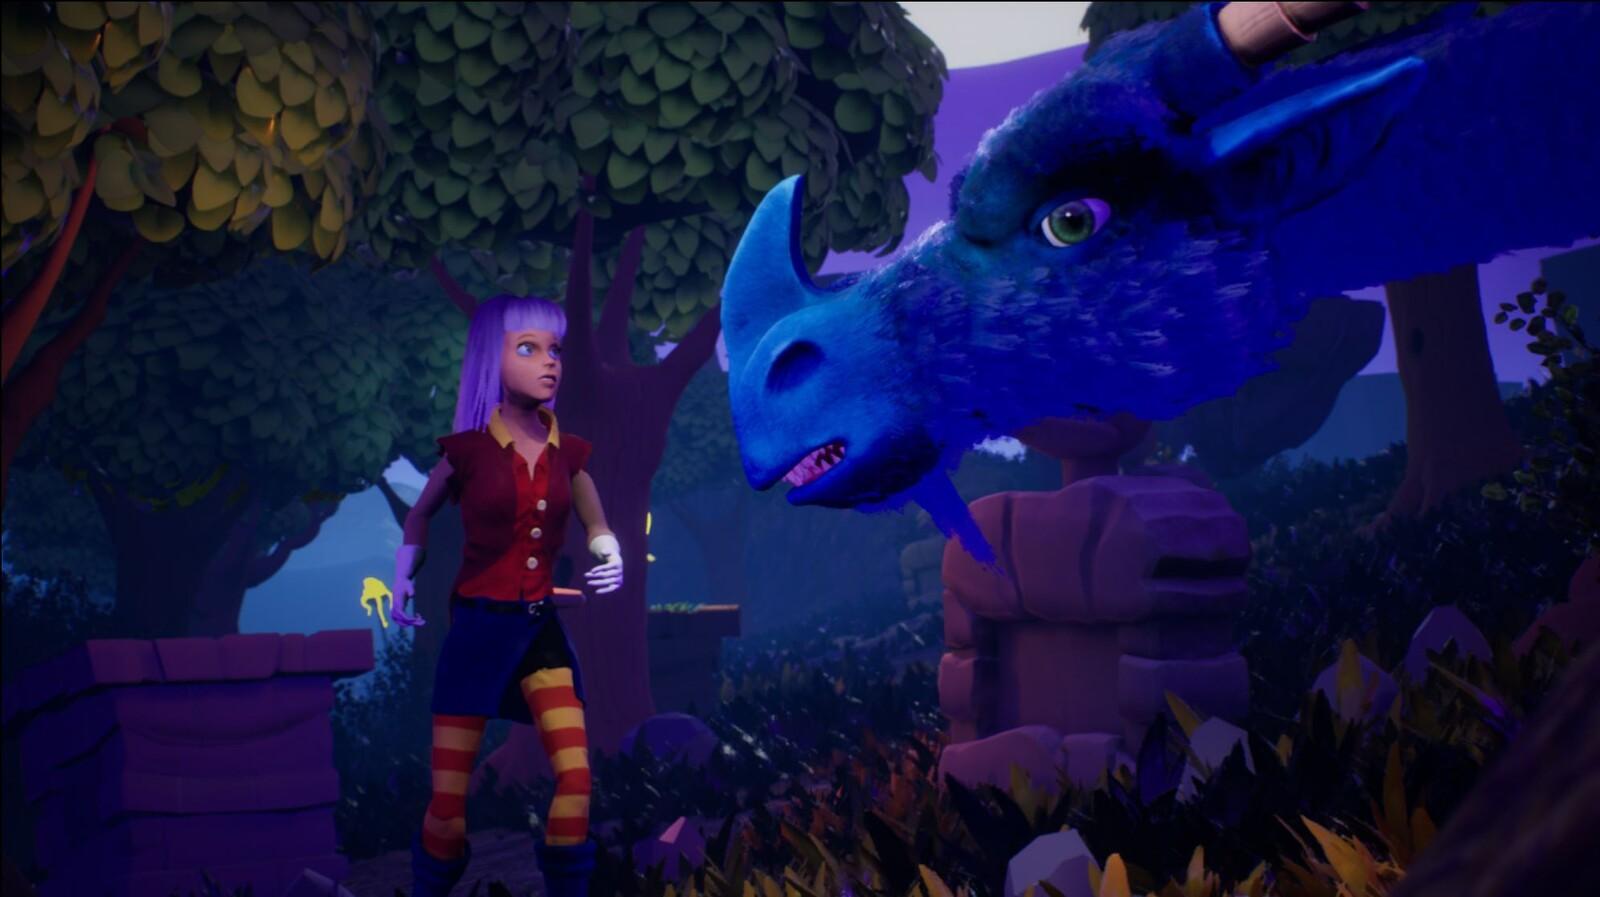 Dragon and Lili (UDK). Promo image, not game screenshot. Lighting and setup by Hans Zenjuga.